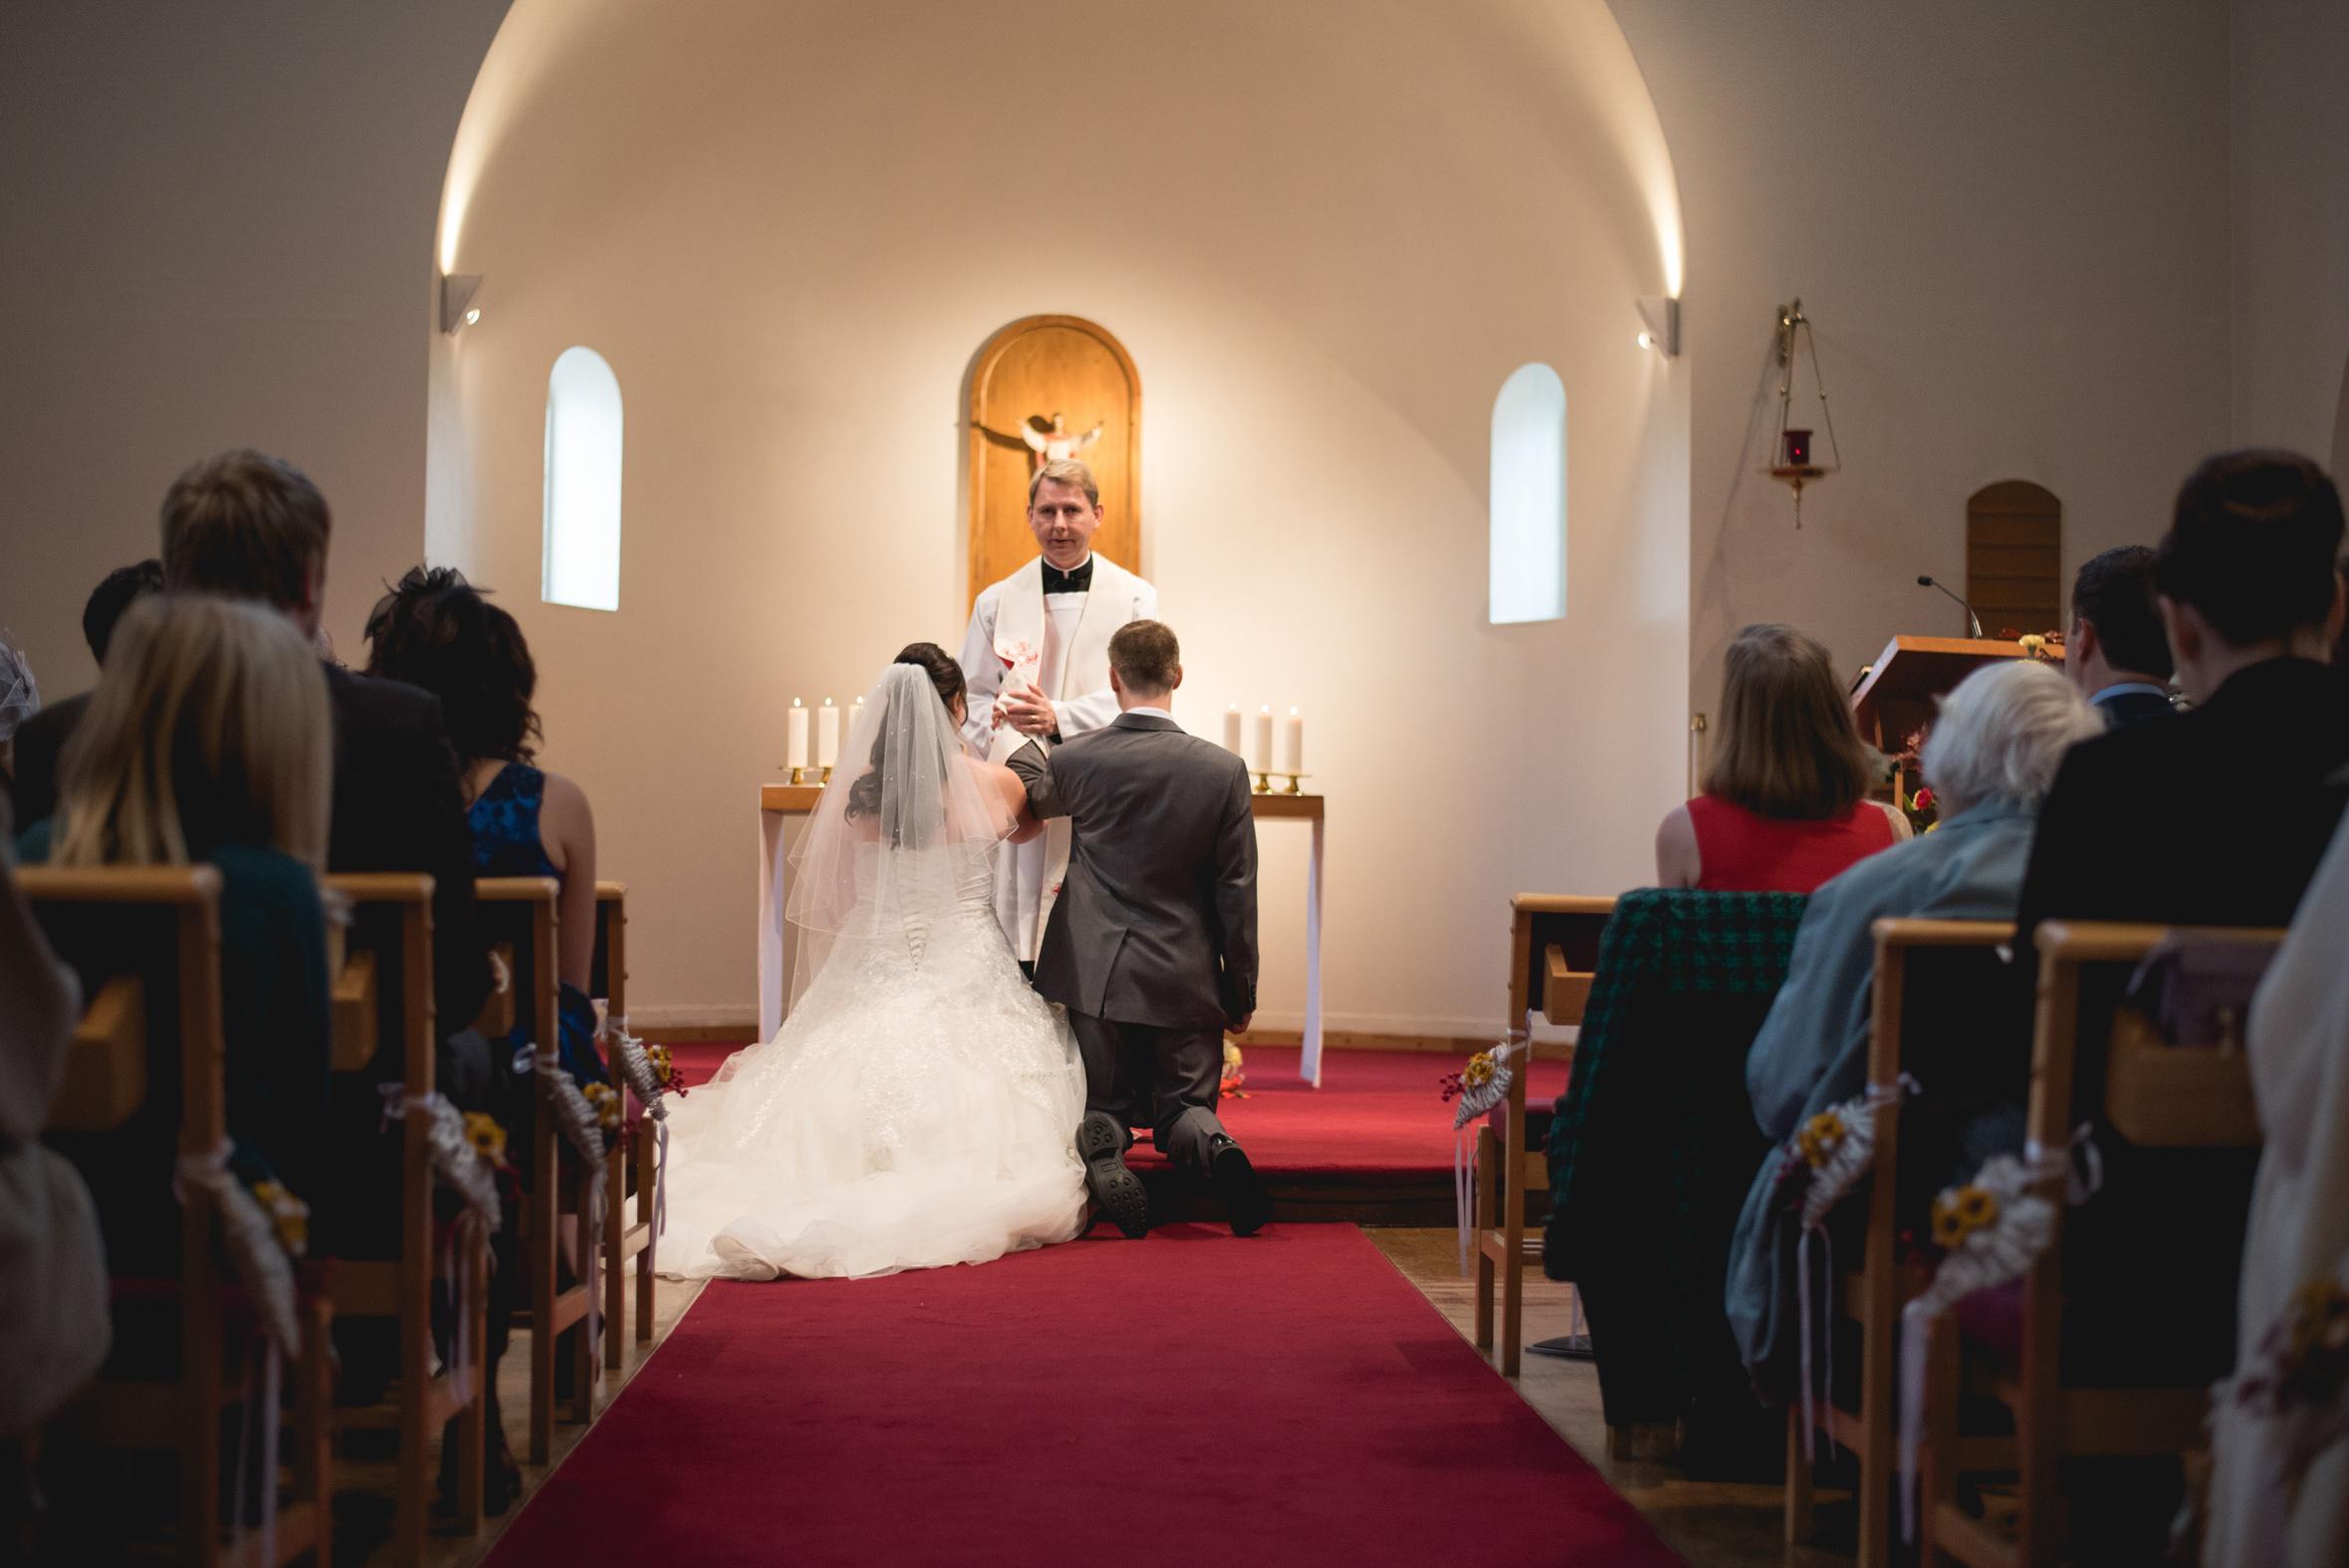 The+Fairlawns+wedding+Aldridge+StLukes+Church-96.jpg